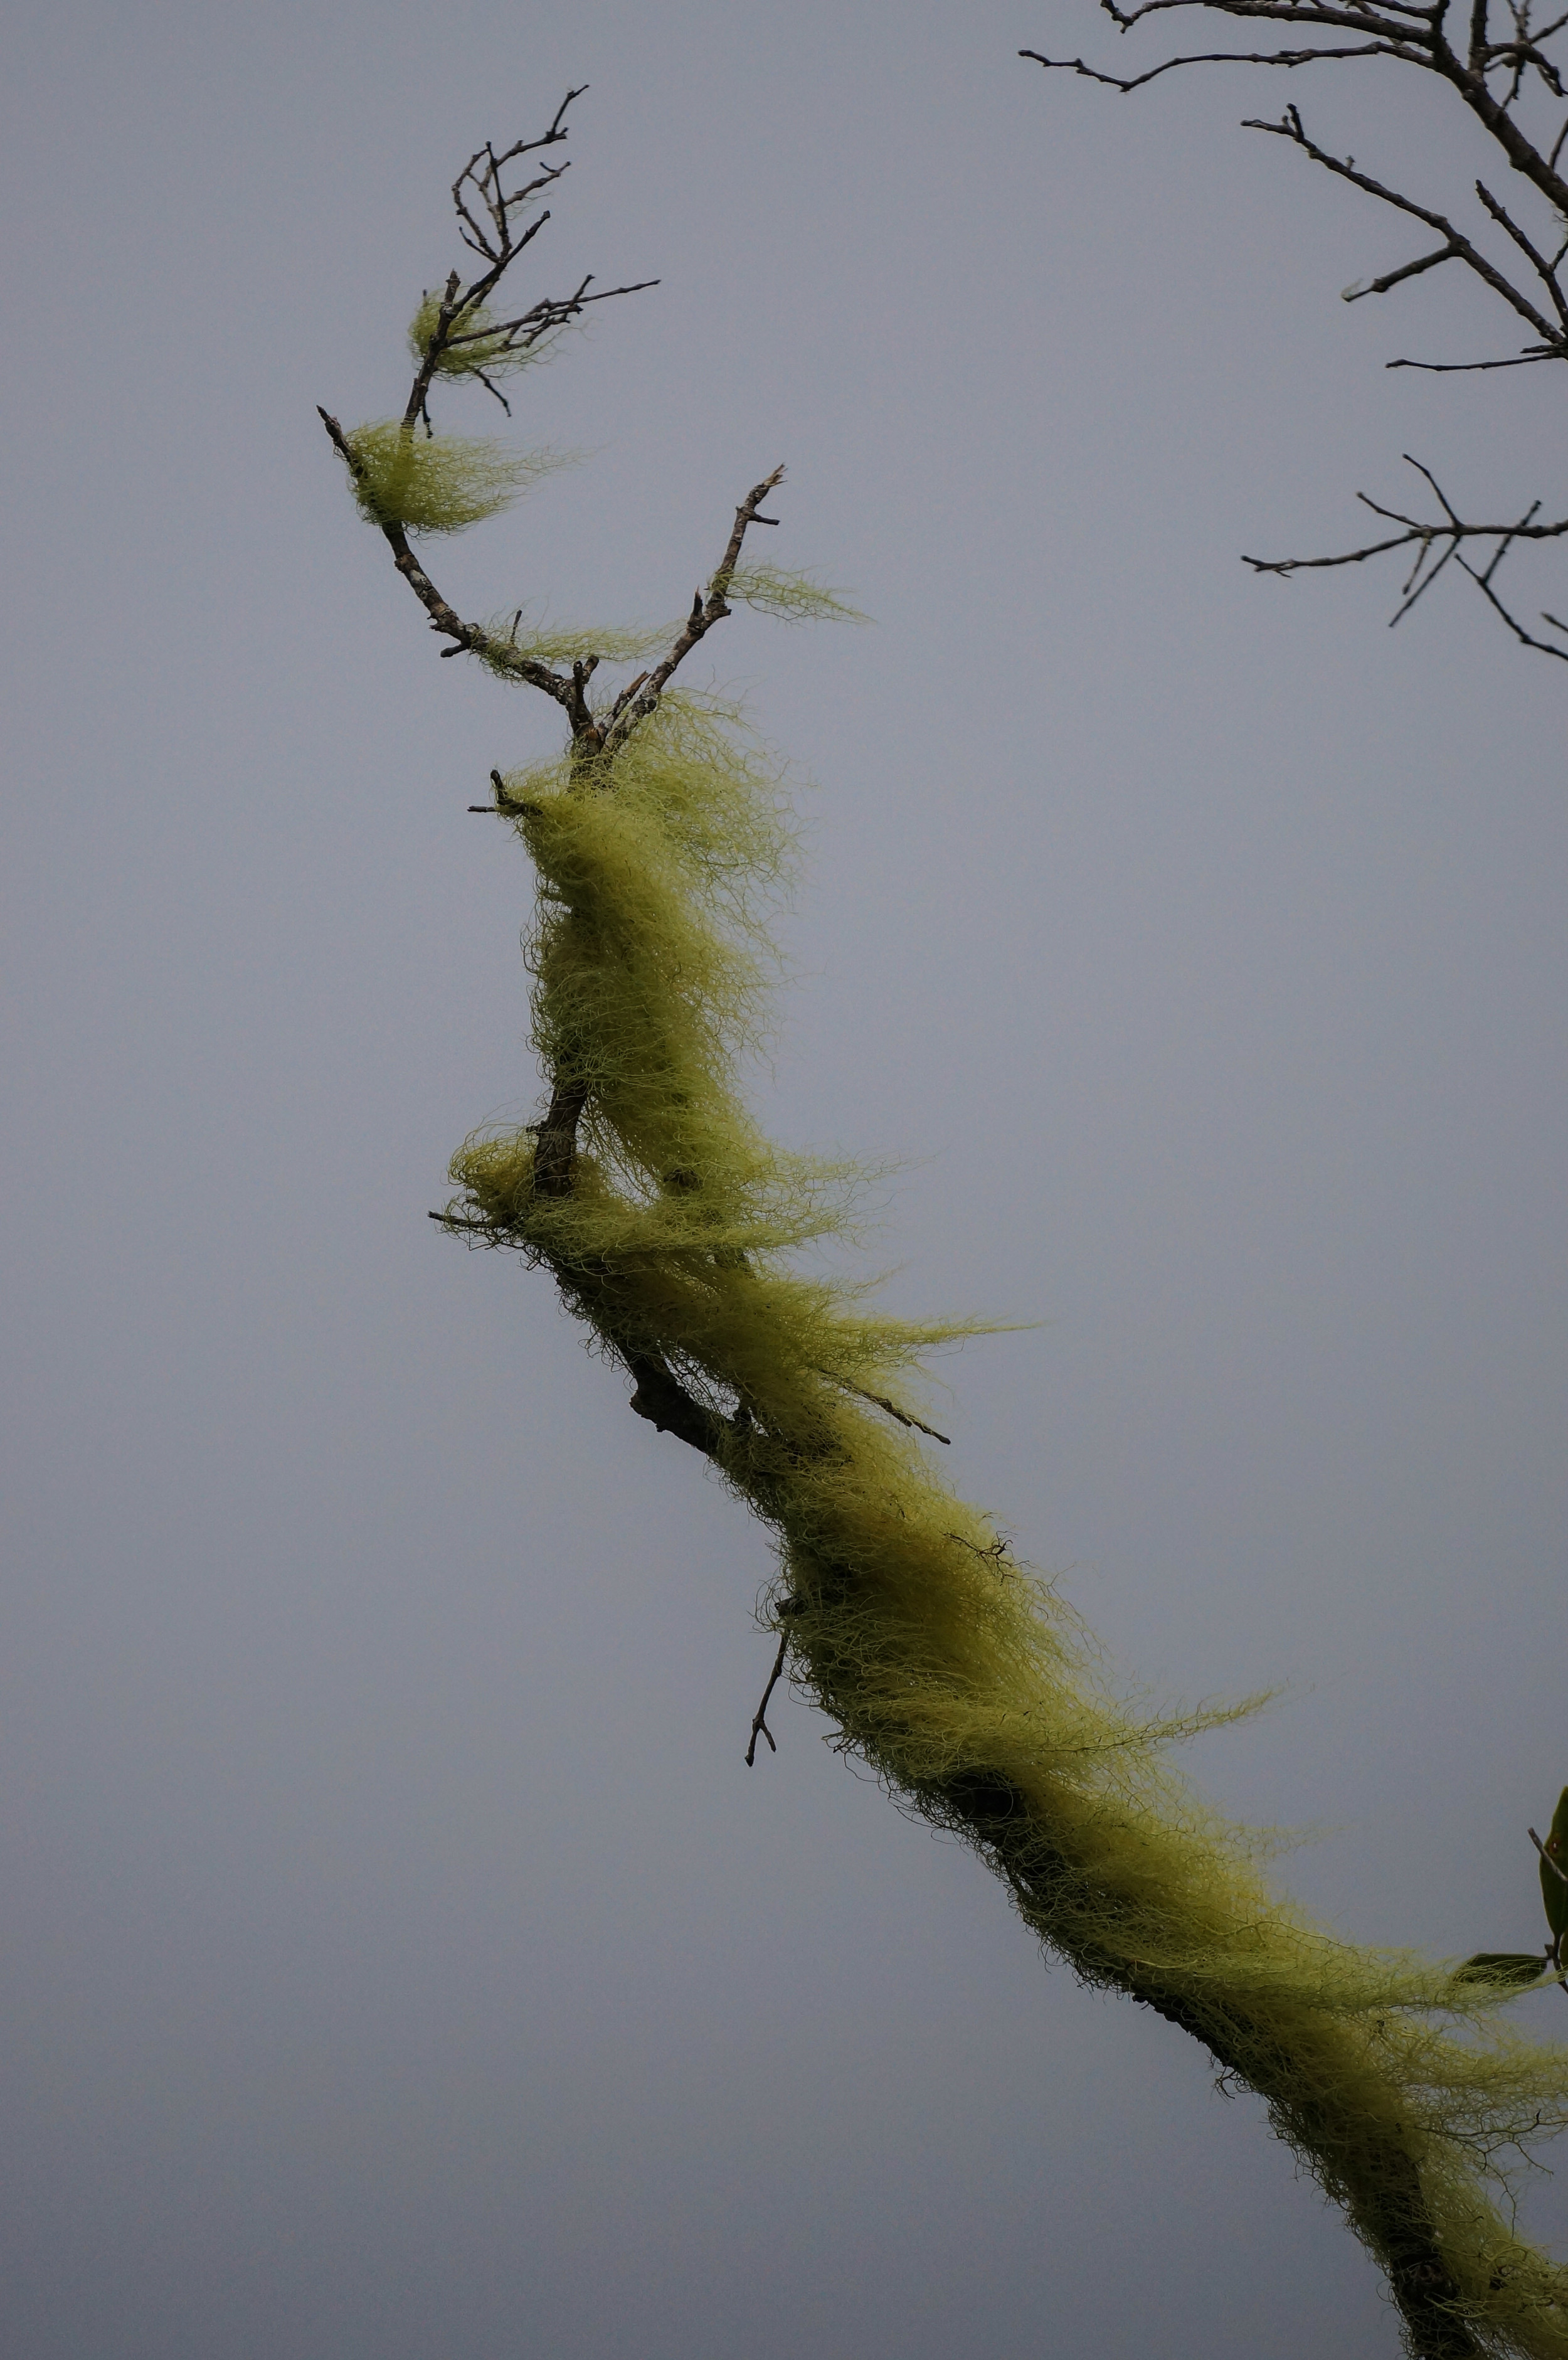 More moss.